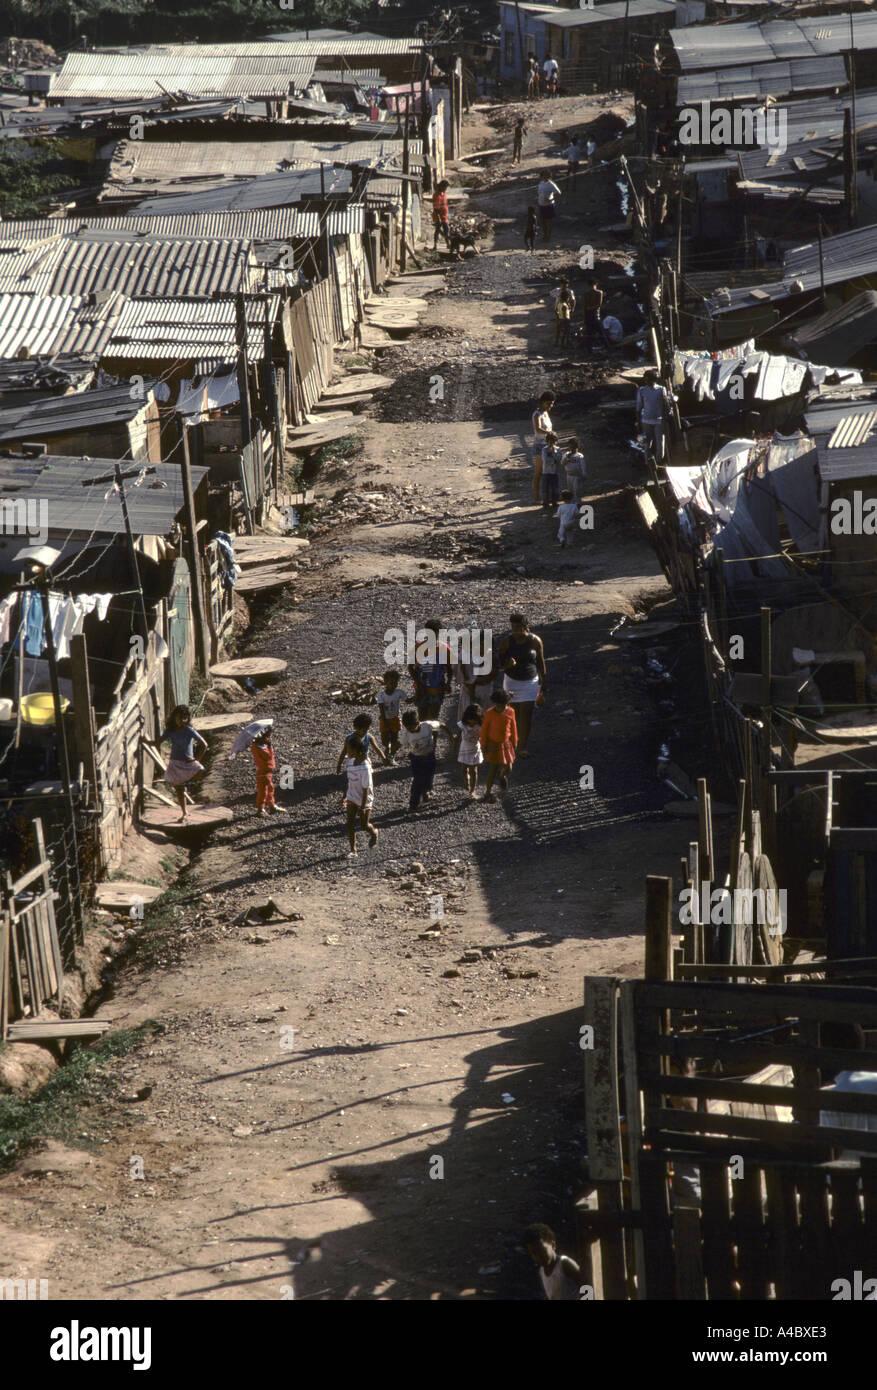 Residents walk along the path between shacks at the Casa Verde land invasion Sao Paulo Brazil - Stock Image